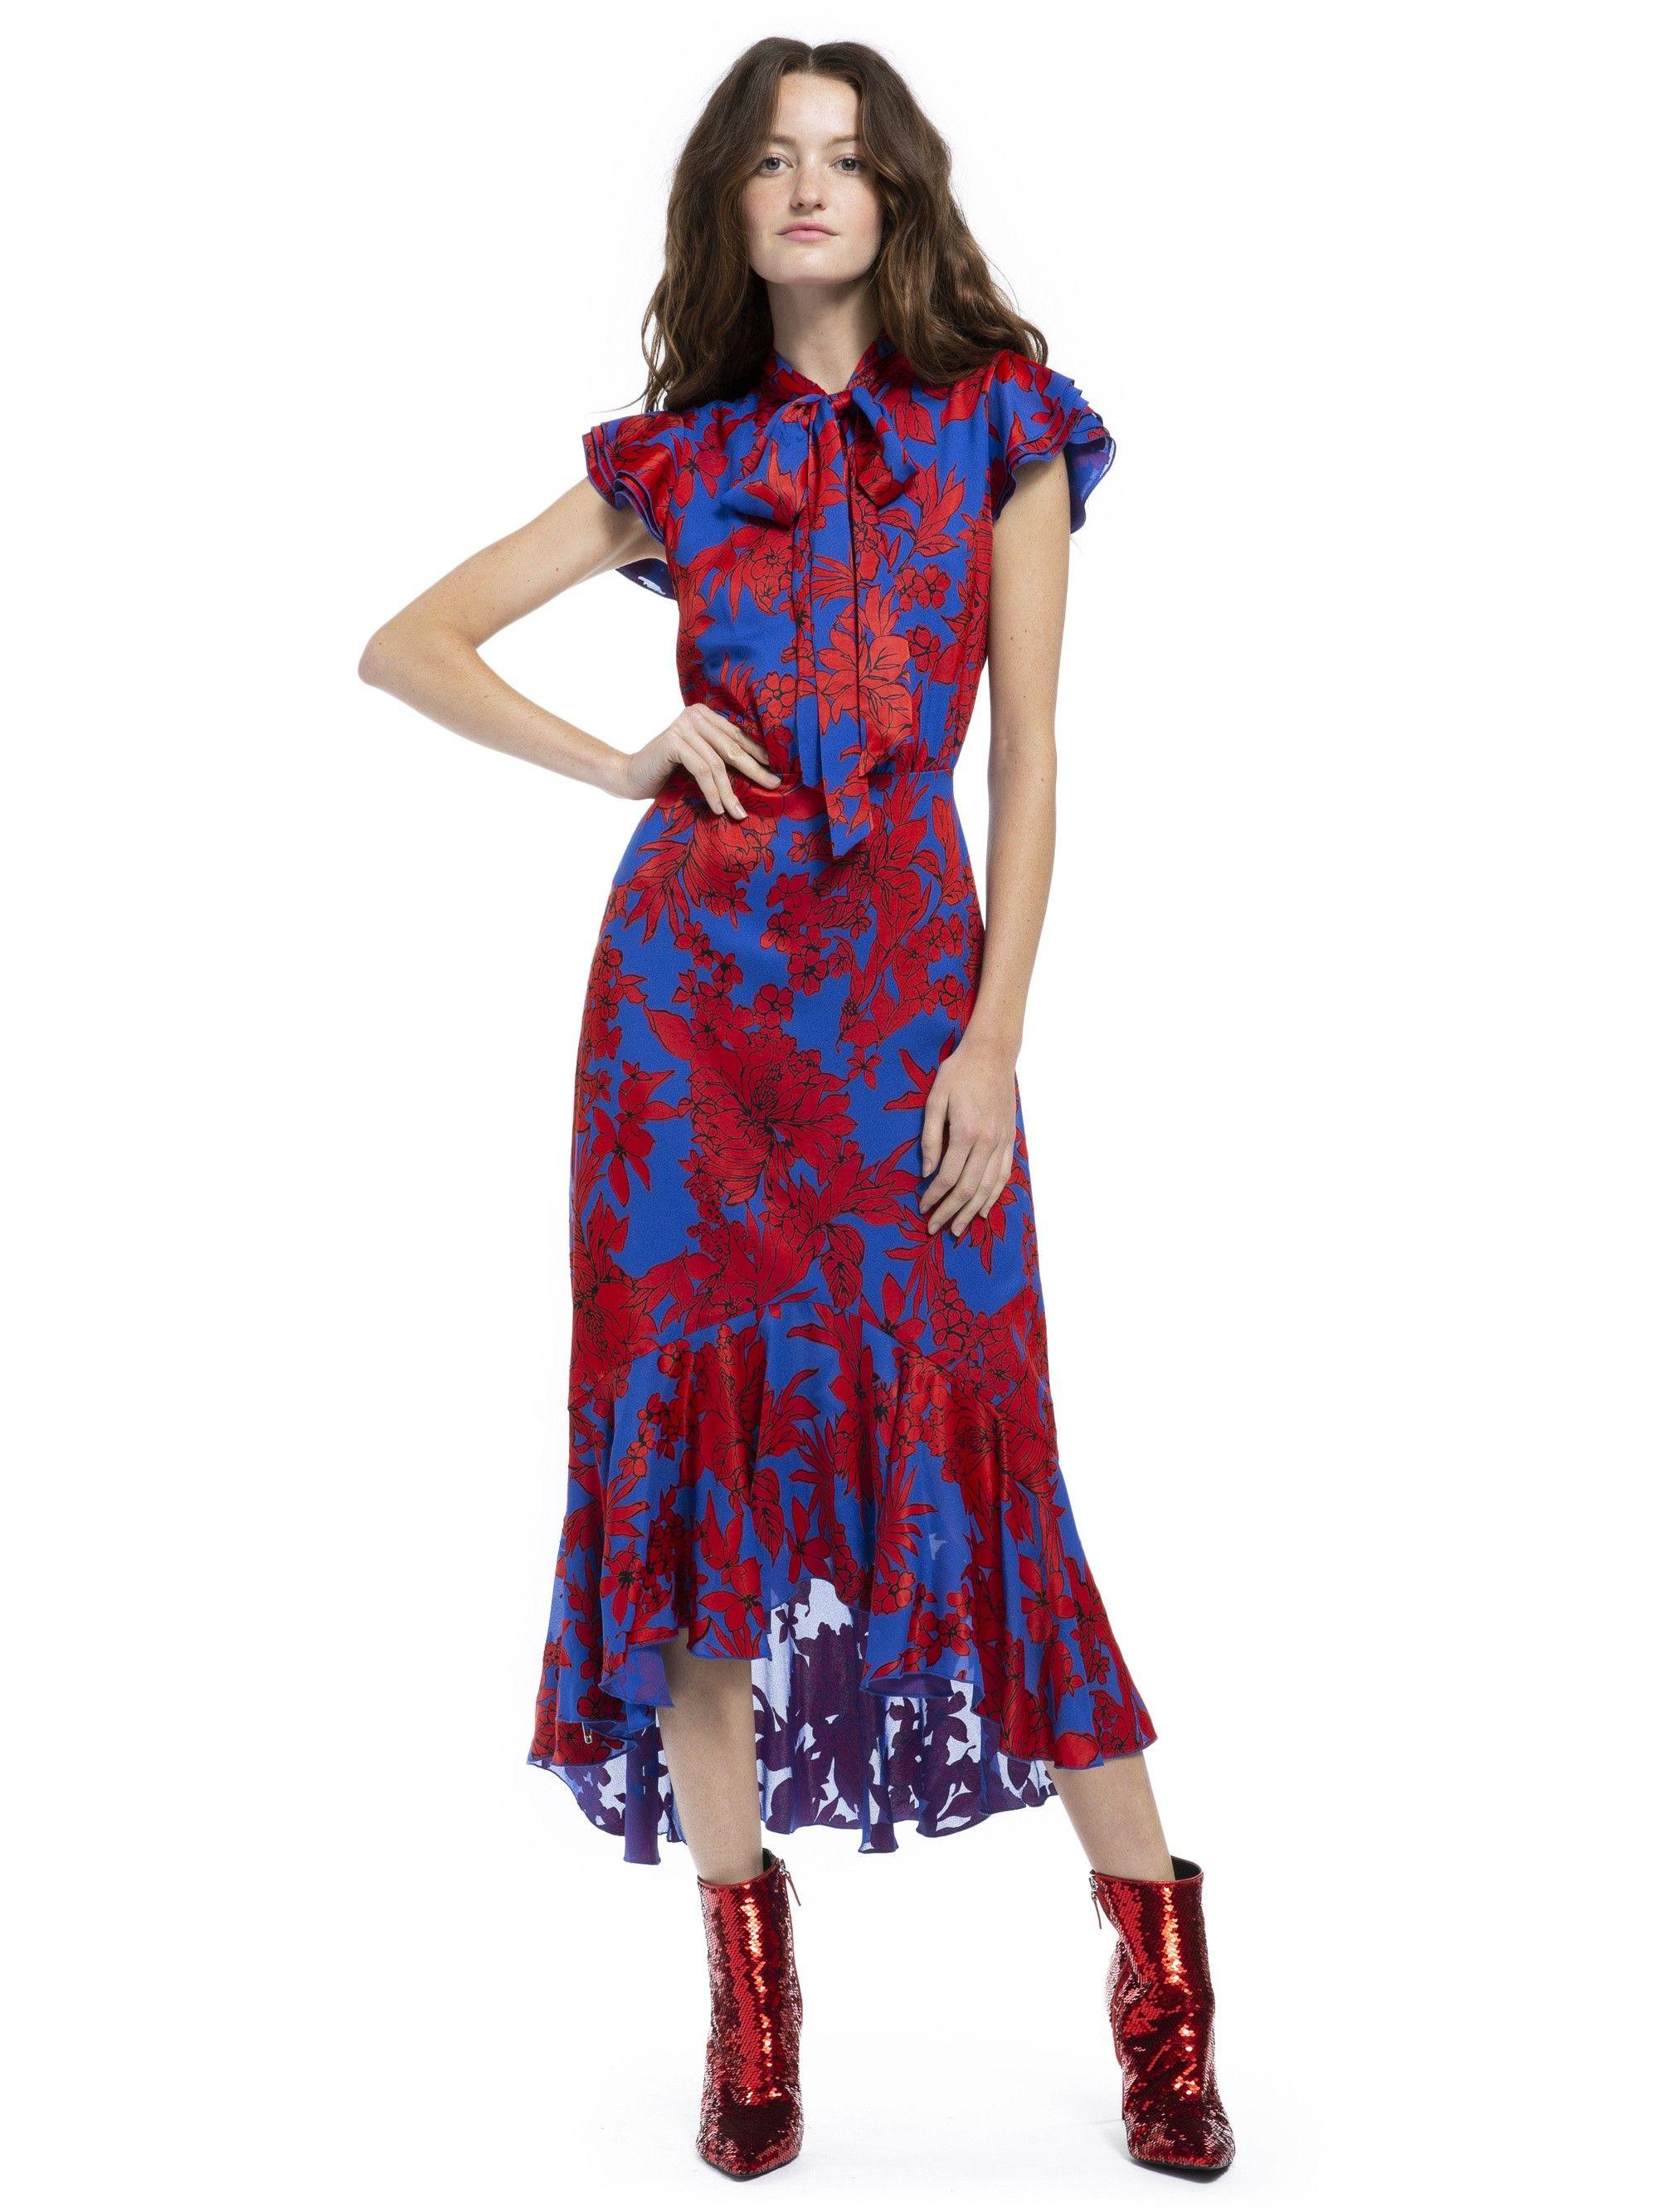 a8811eca60c Alice + Olivia Greta Ruffle Hem Midi Dress - Fancy Floral 2